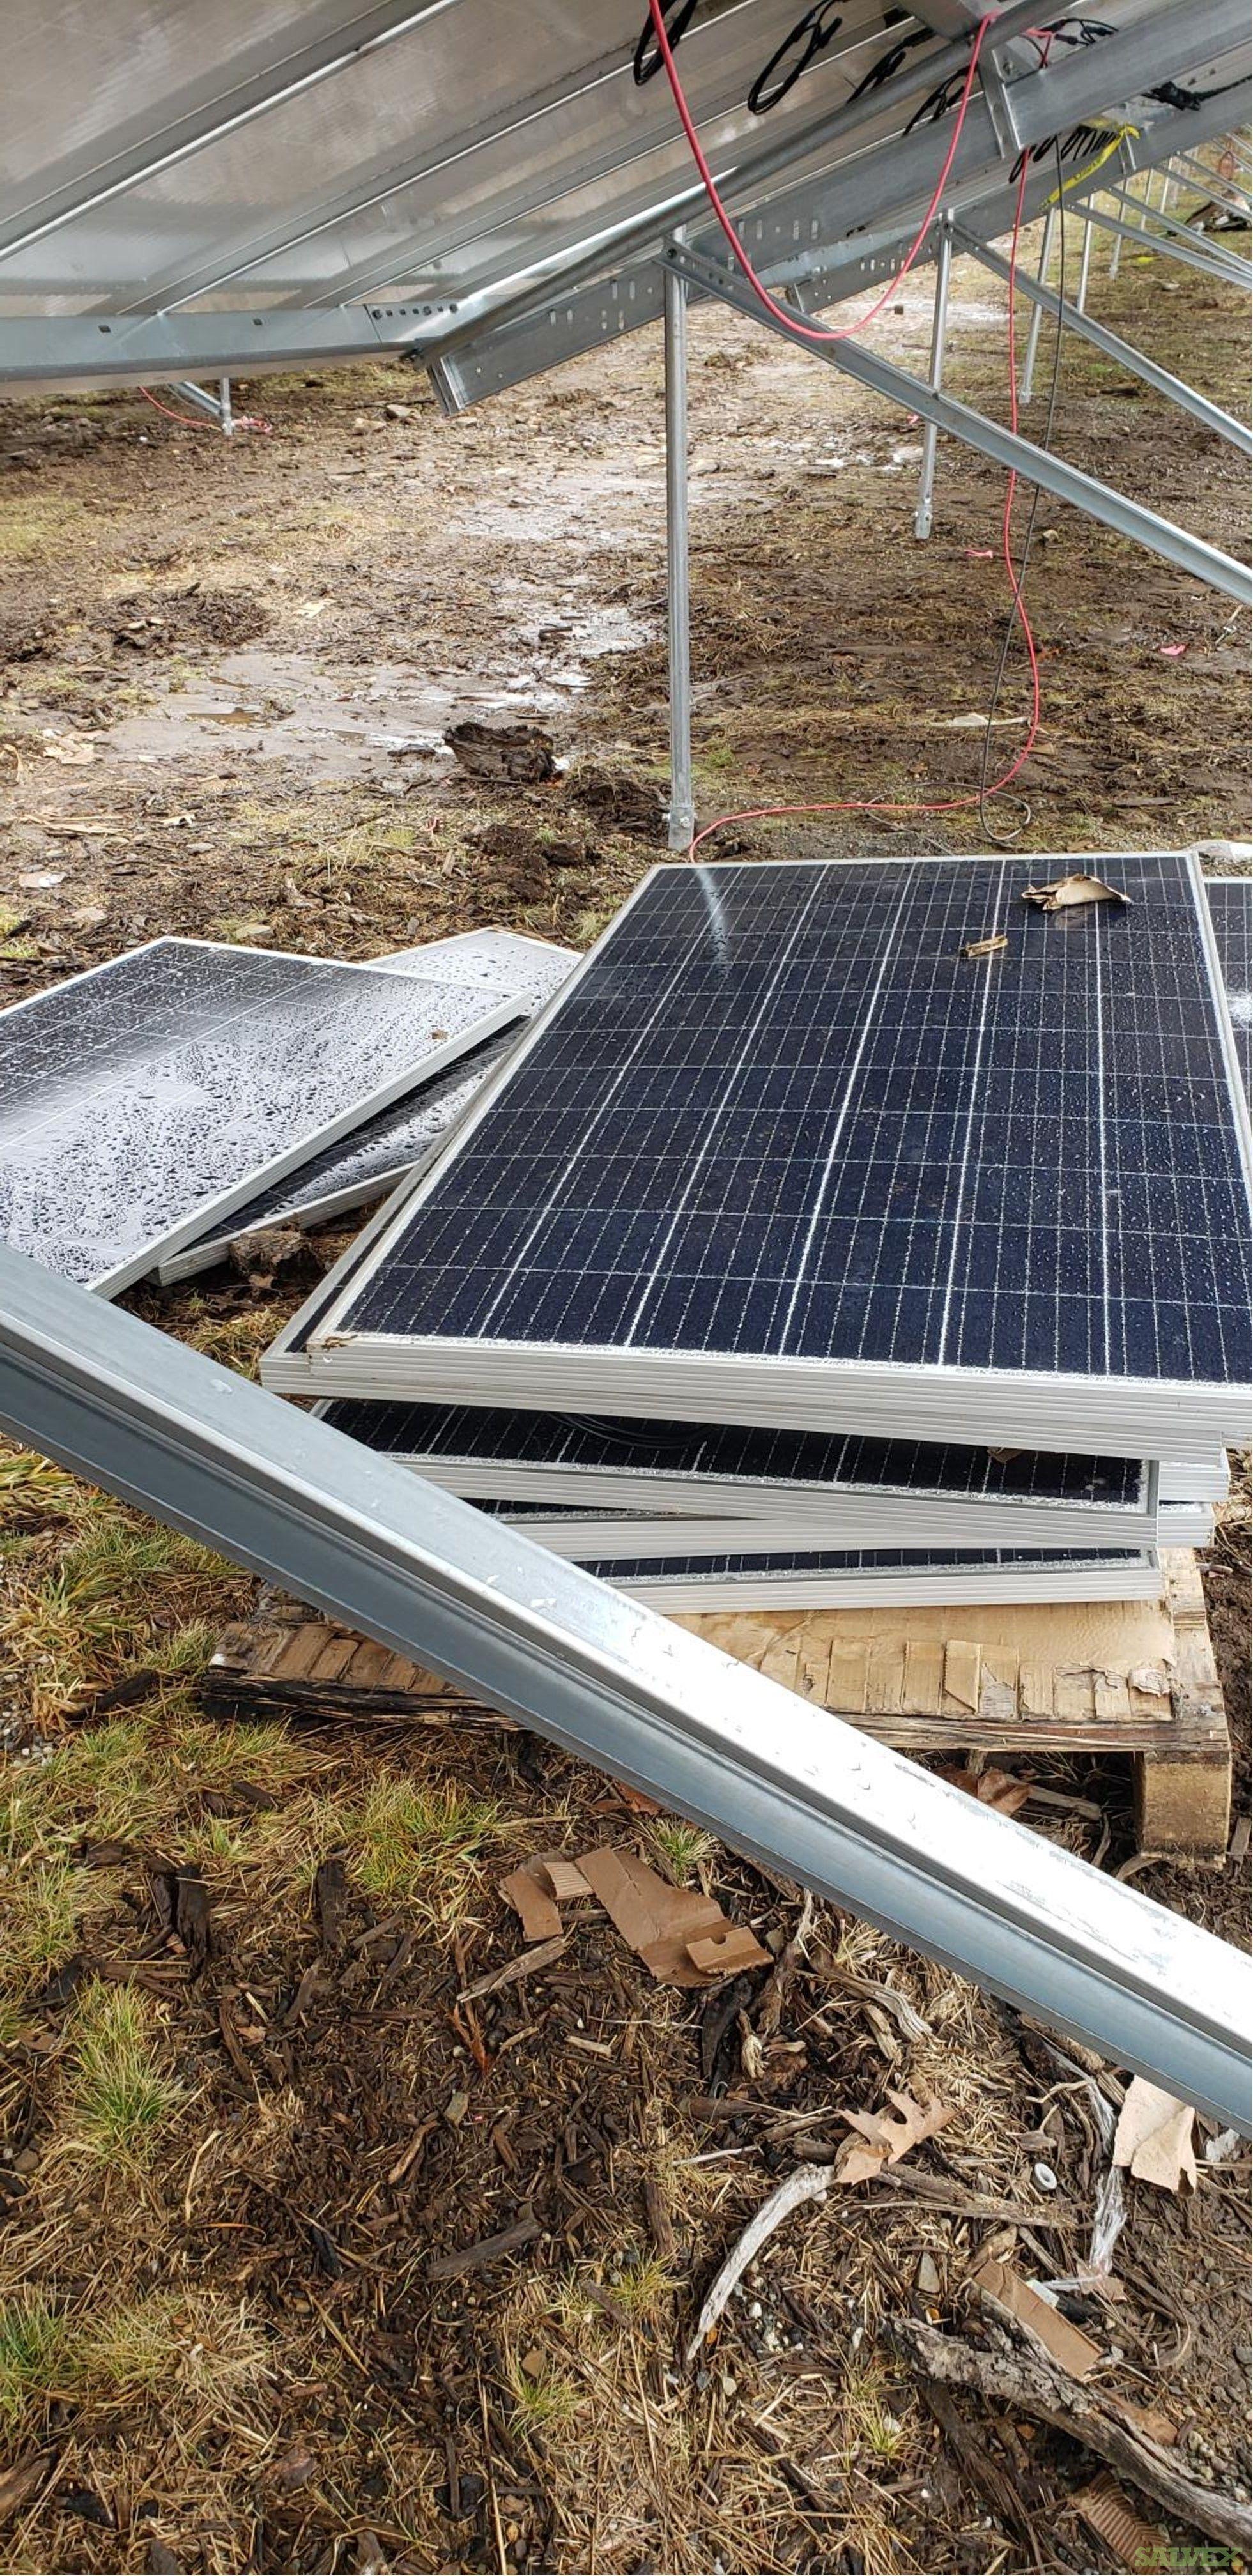 Trina & LG 330-405W Bifacial Solar Modules (650 Modules)